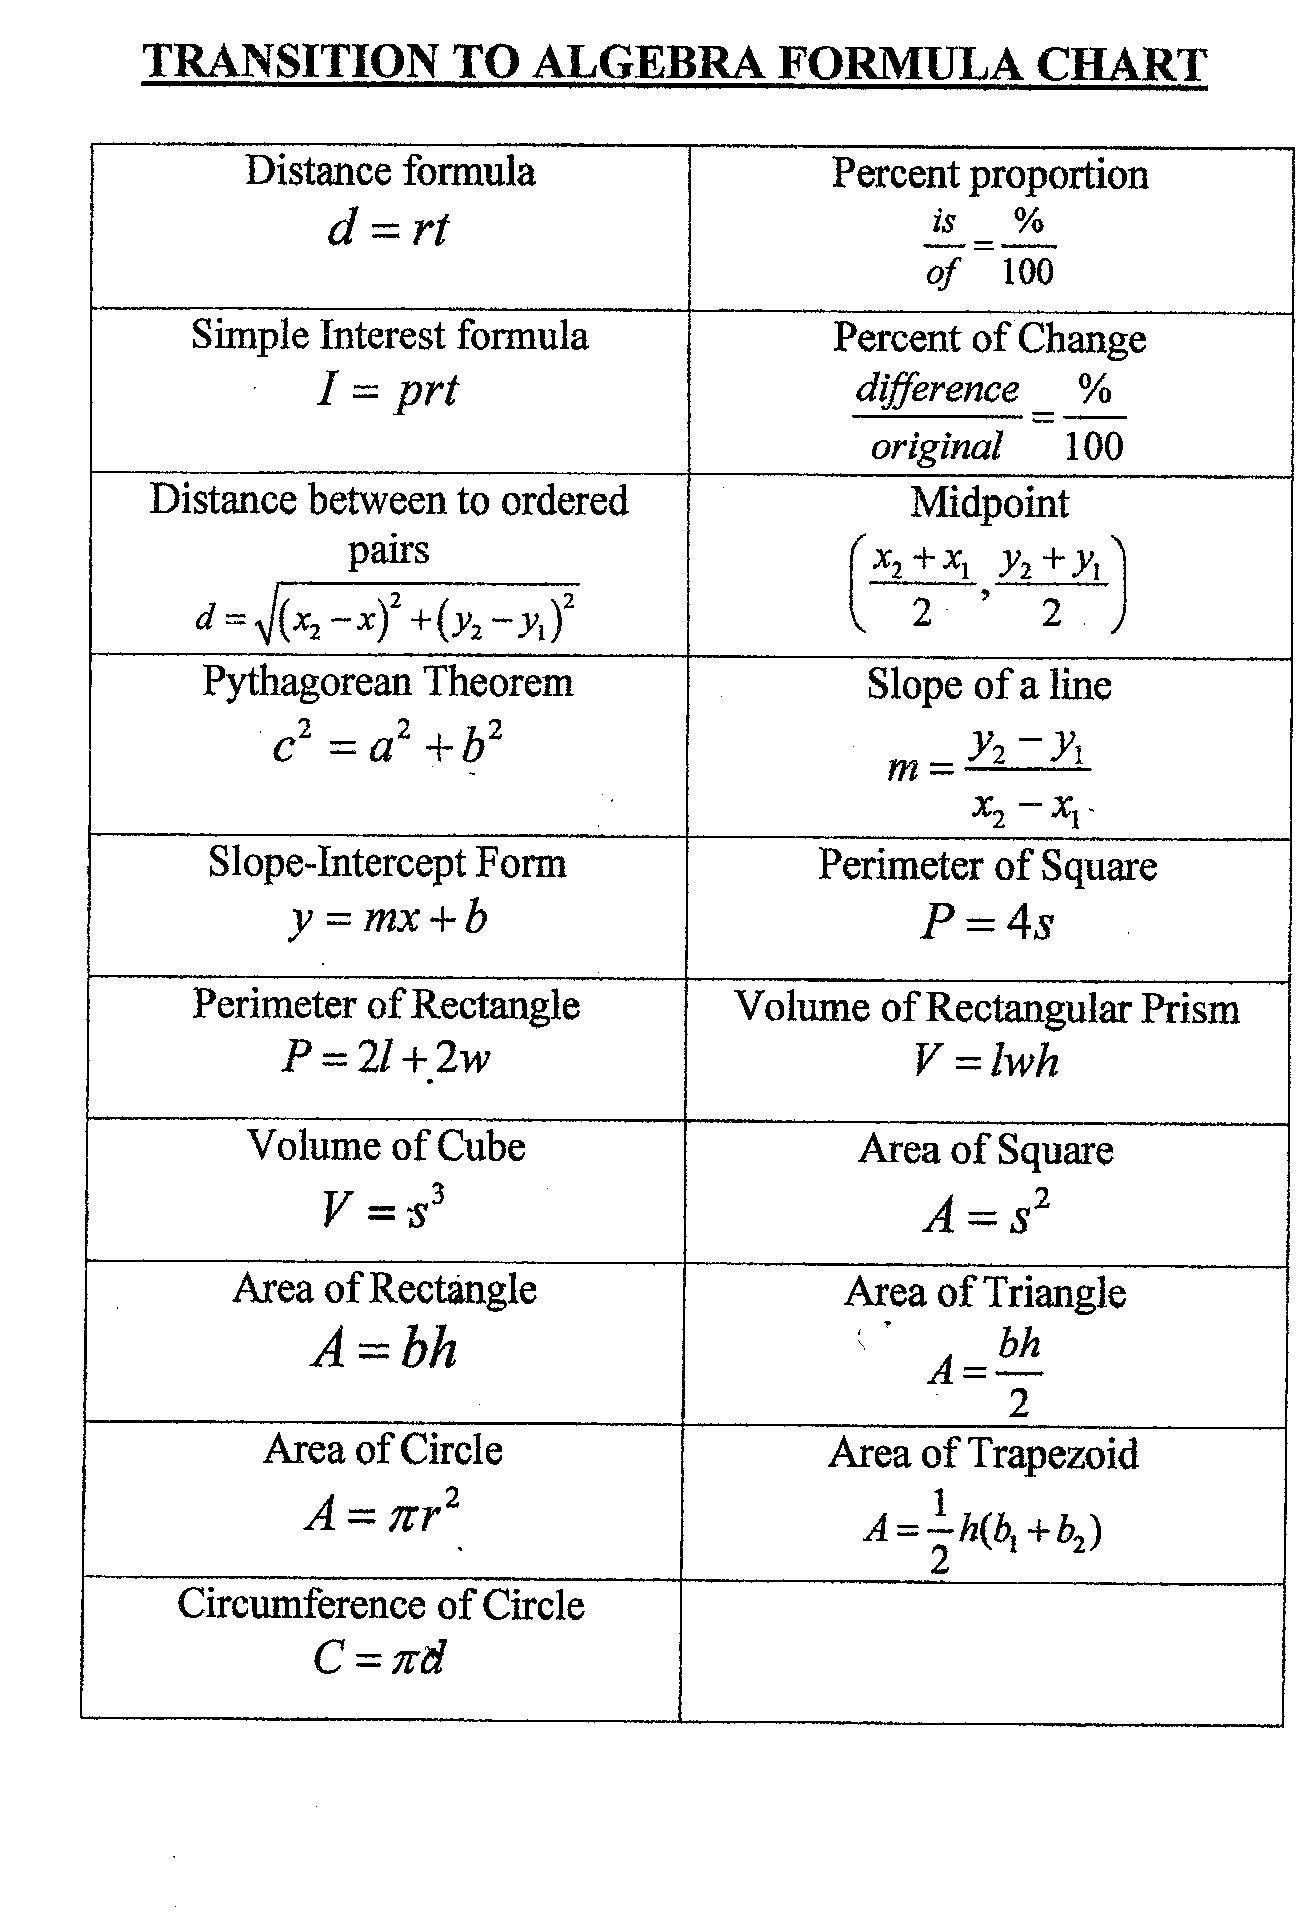 Math Worksheet : Free Printable Cheat Sheets Algebra Math Reference - Free Printable Physics Worksheets